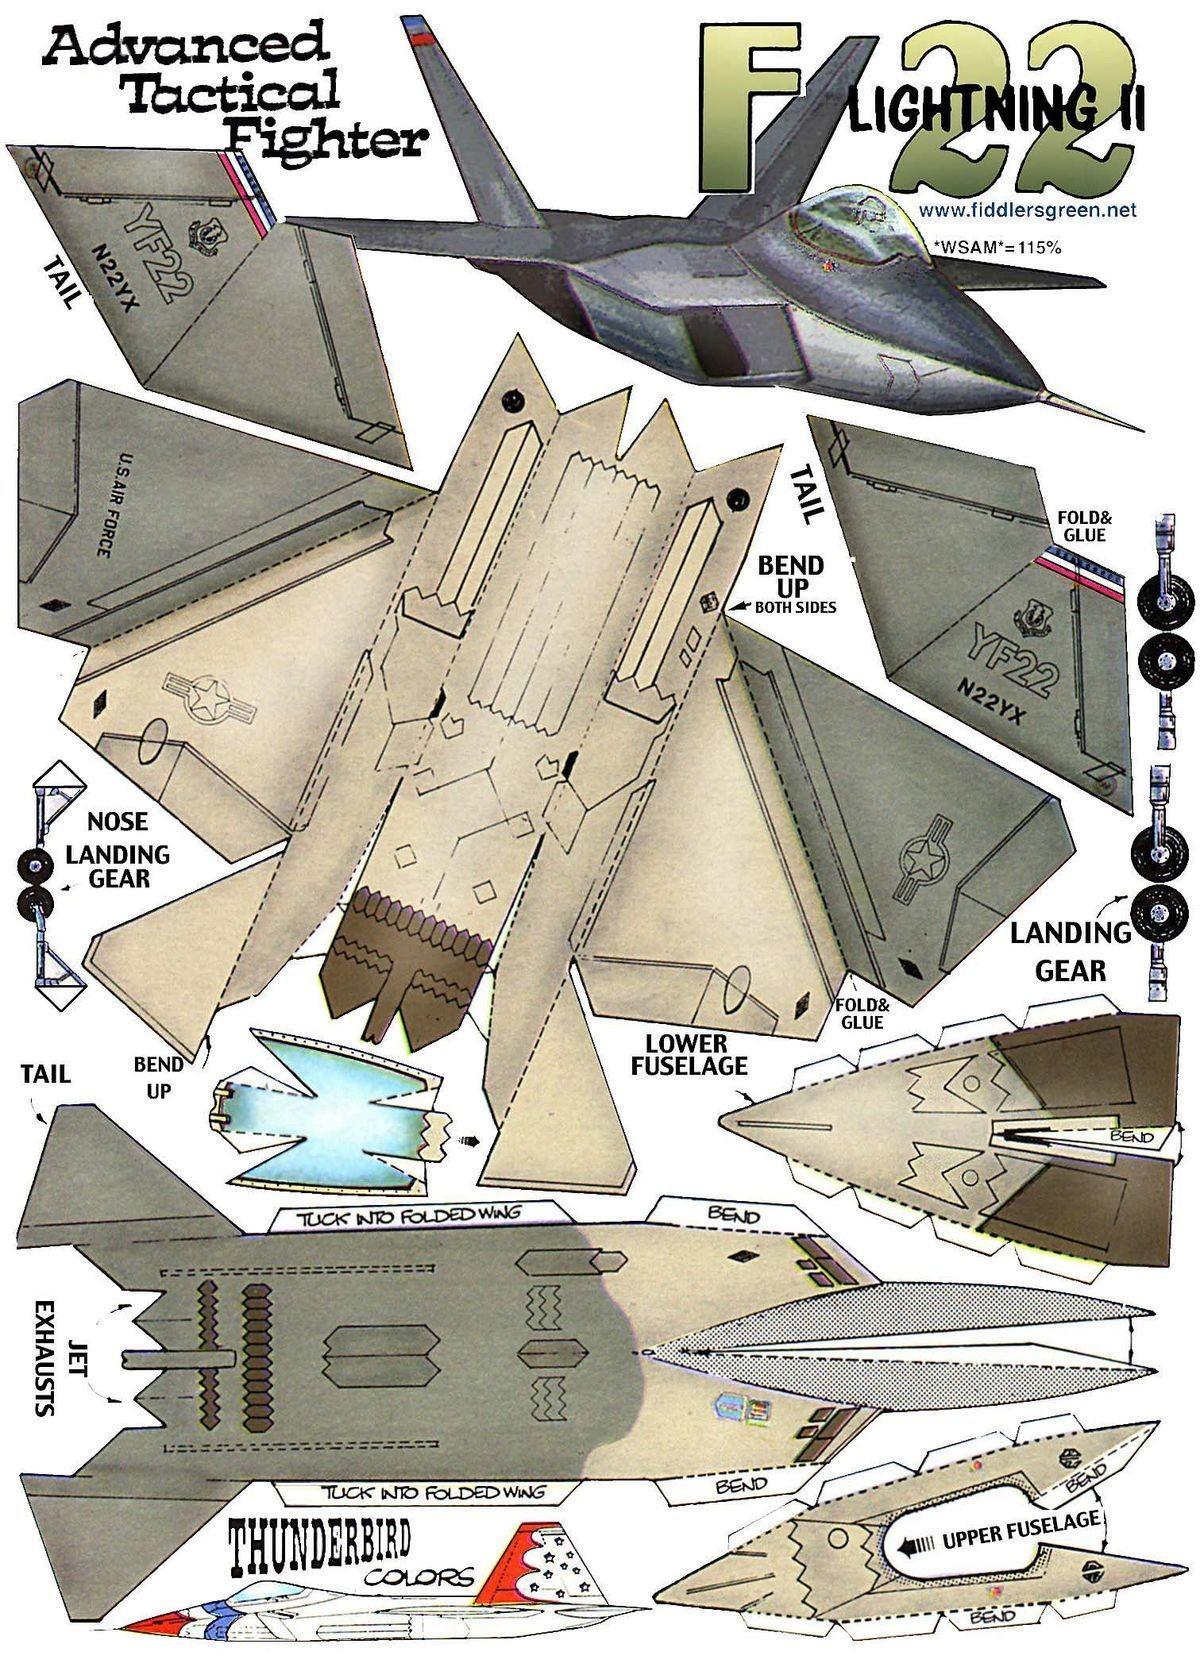 Airplane Papercraft 6f182ac D378aaebcb9a A0 1 200—1 667 Pixels